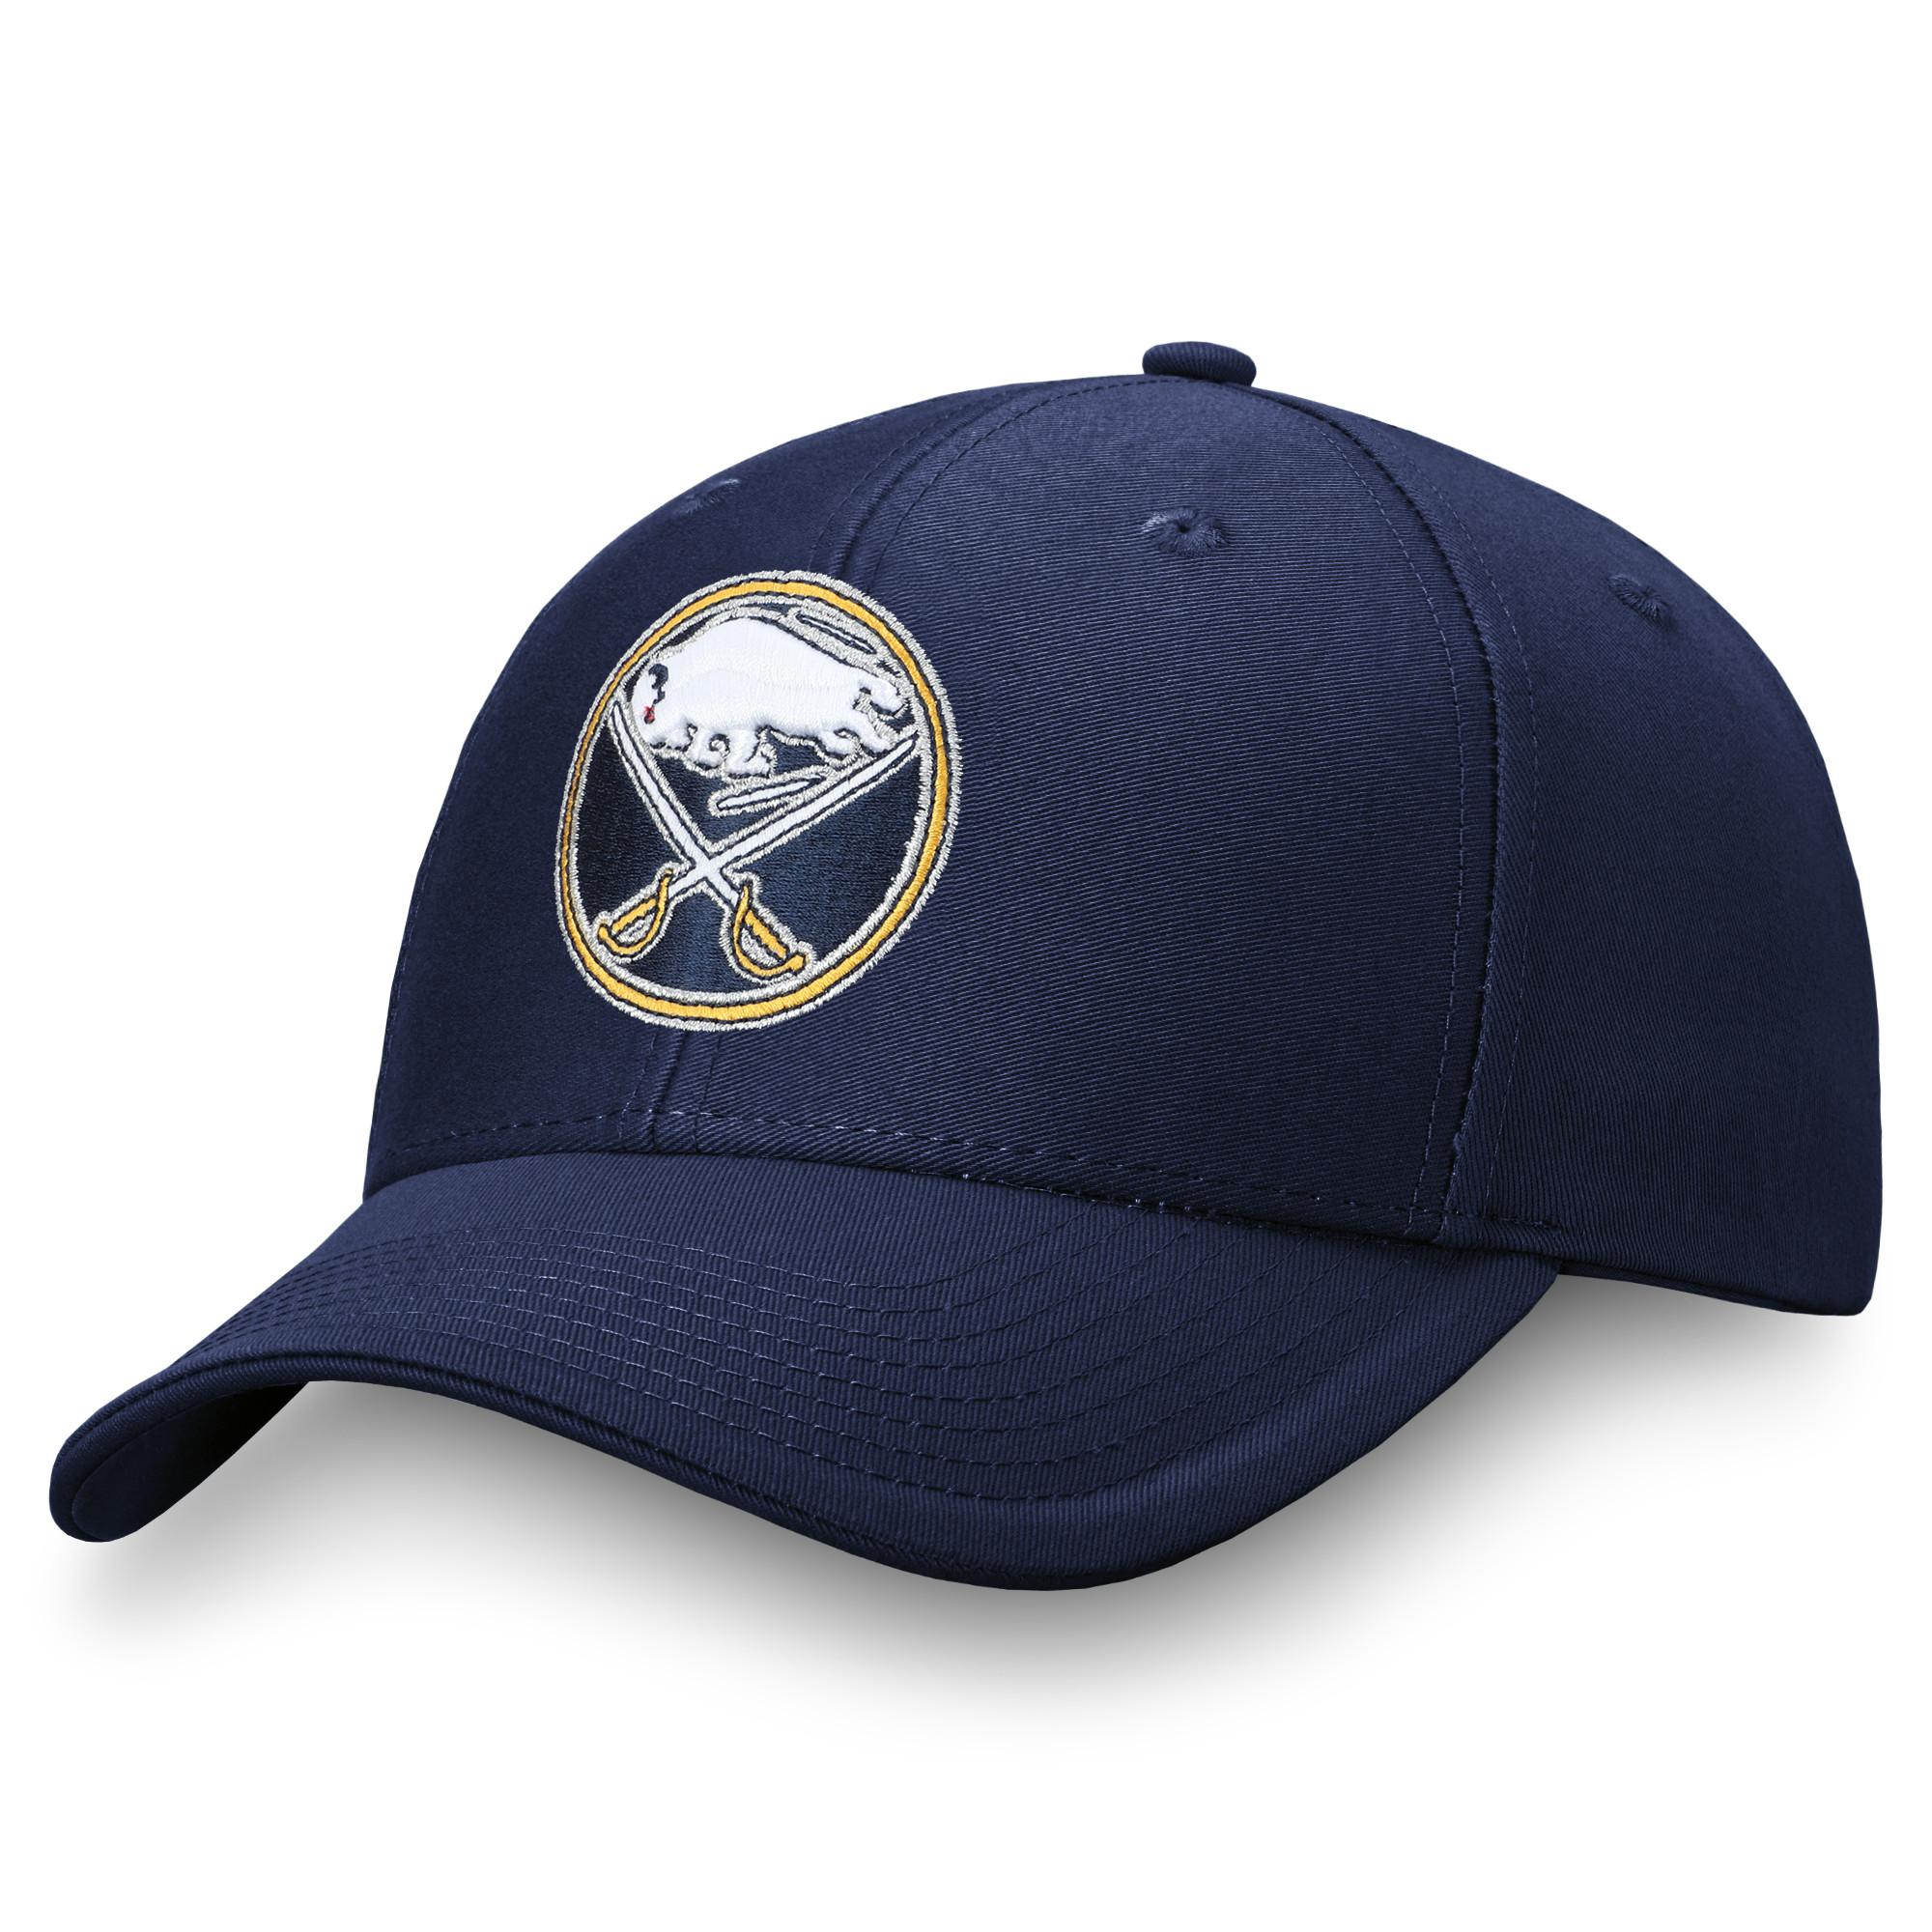 Men's Fanatics Branded Navy Buffalo Sabres Adjustable Hat - OSFA